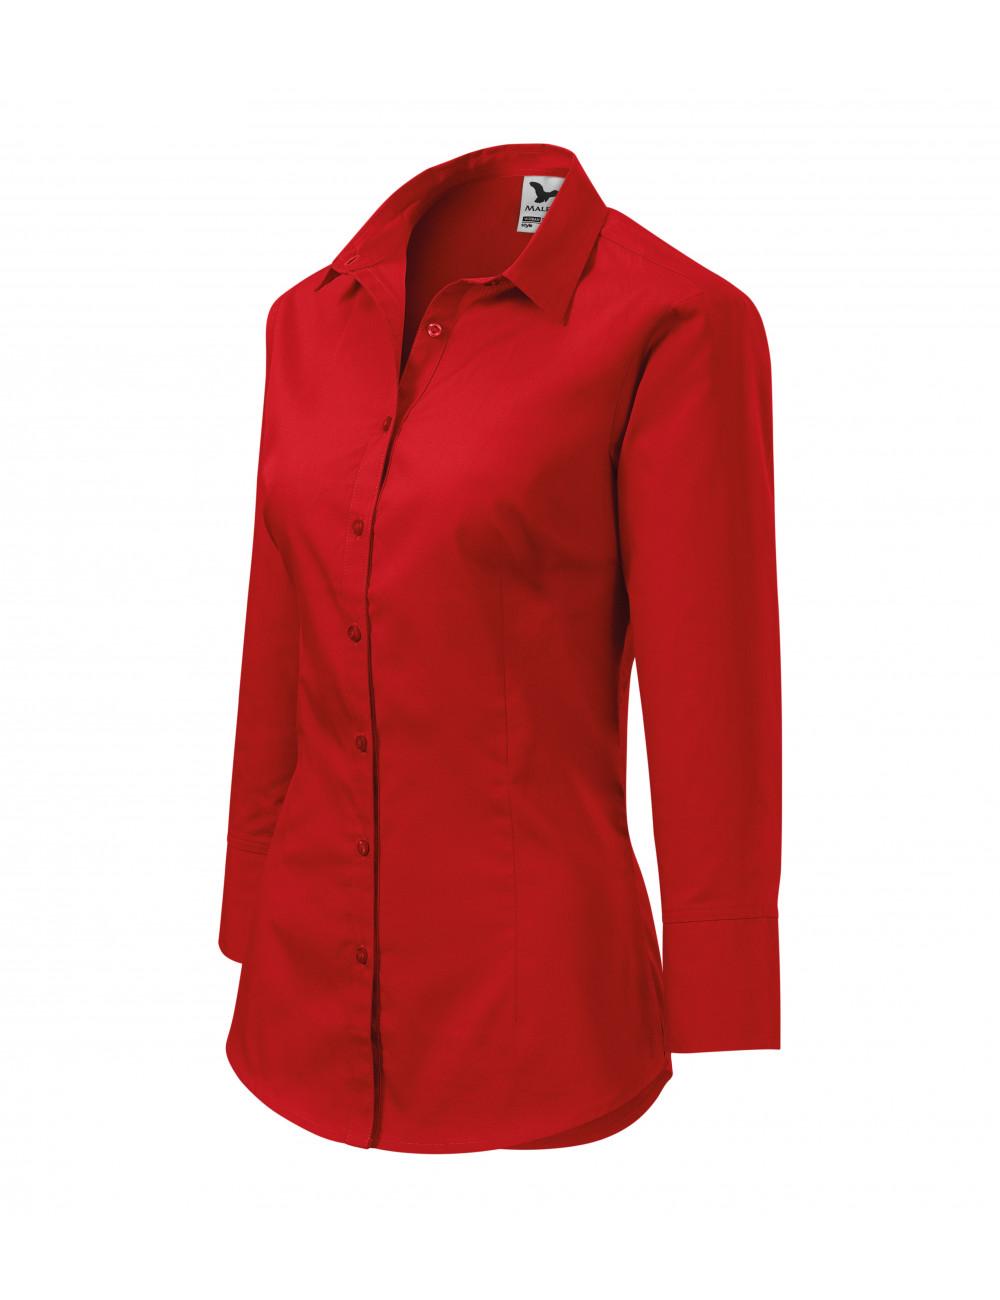 Adler MALFINI Koszula damska Style 218 czerwony